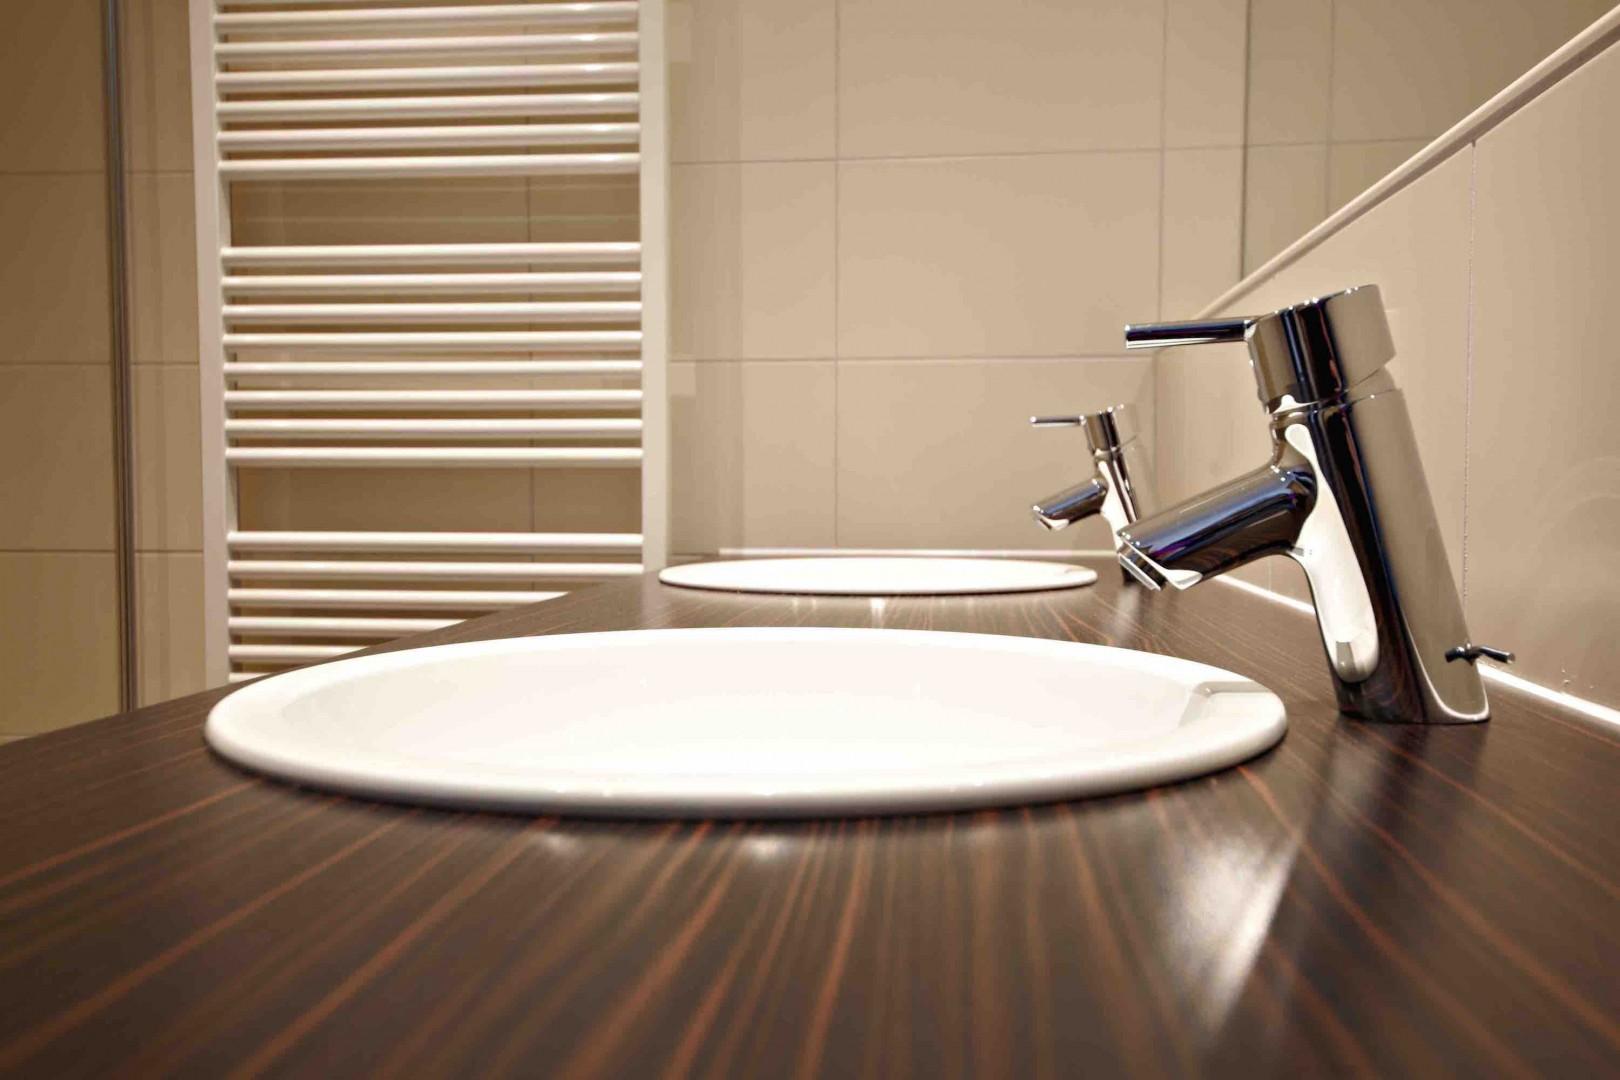 Bathroom at the Young Generation Resort Buchegg